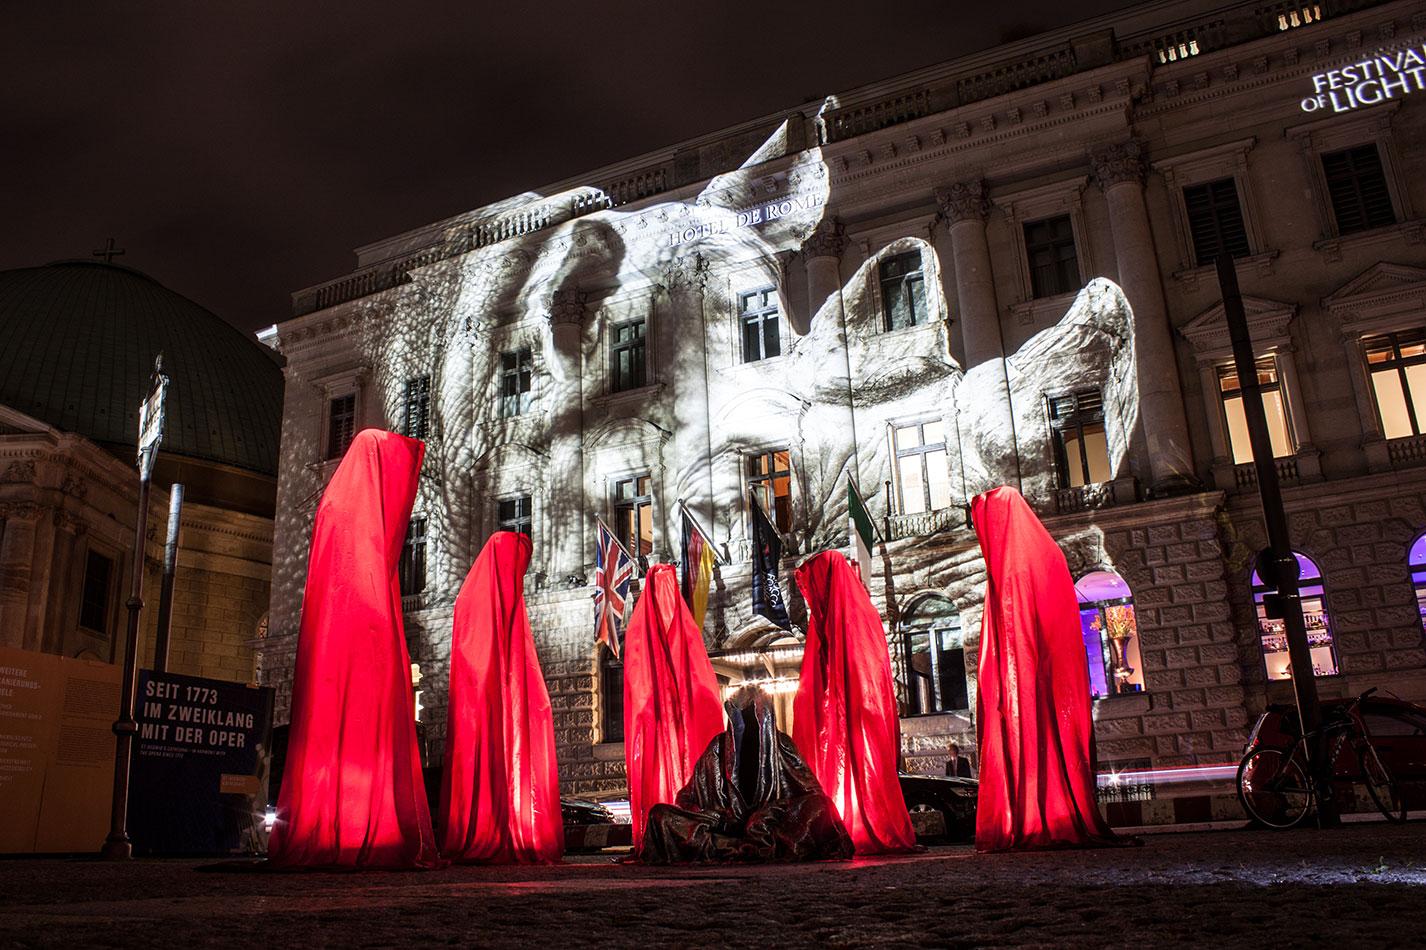 festival-of-lights-berlin-hotel-de-rome-light-art-show-exhibition-lumina-guardians-of-time-manfred-kili-kielnhofer-contemporary-arts-design-sculpture-3387